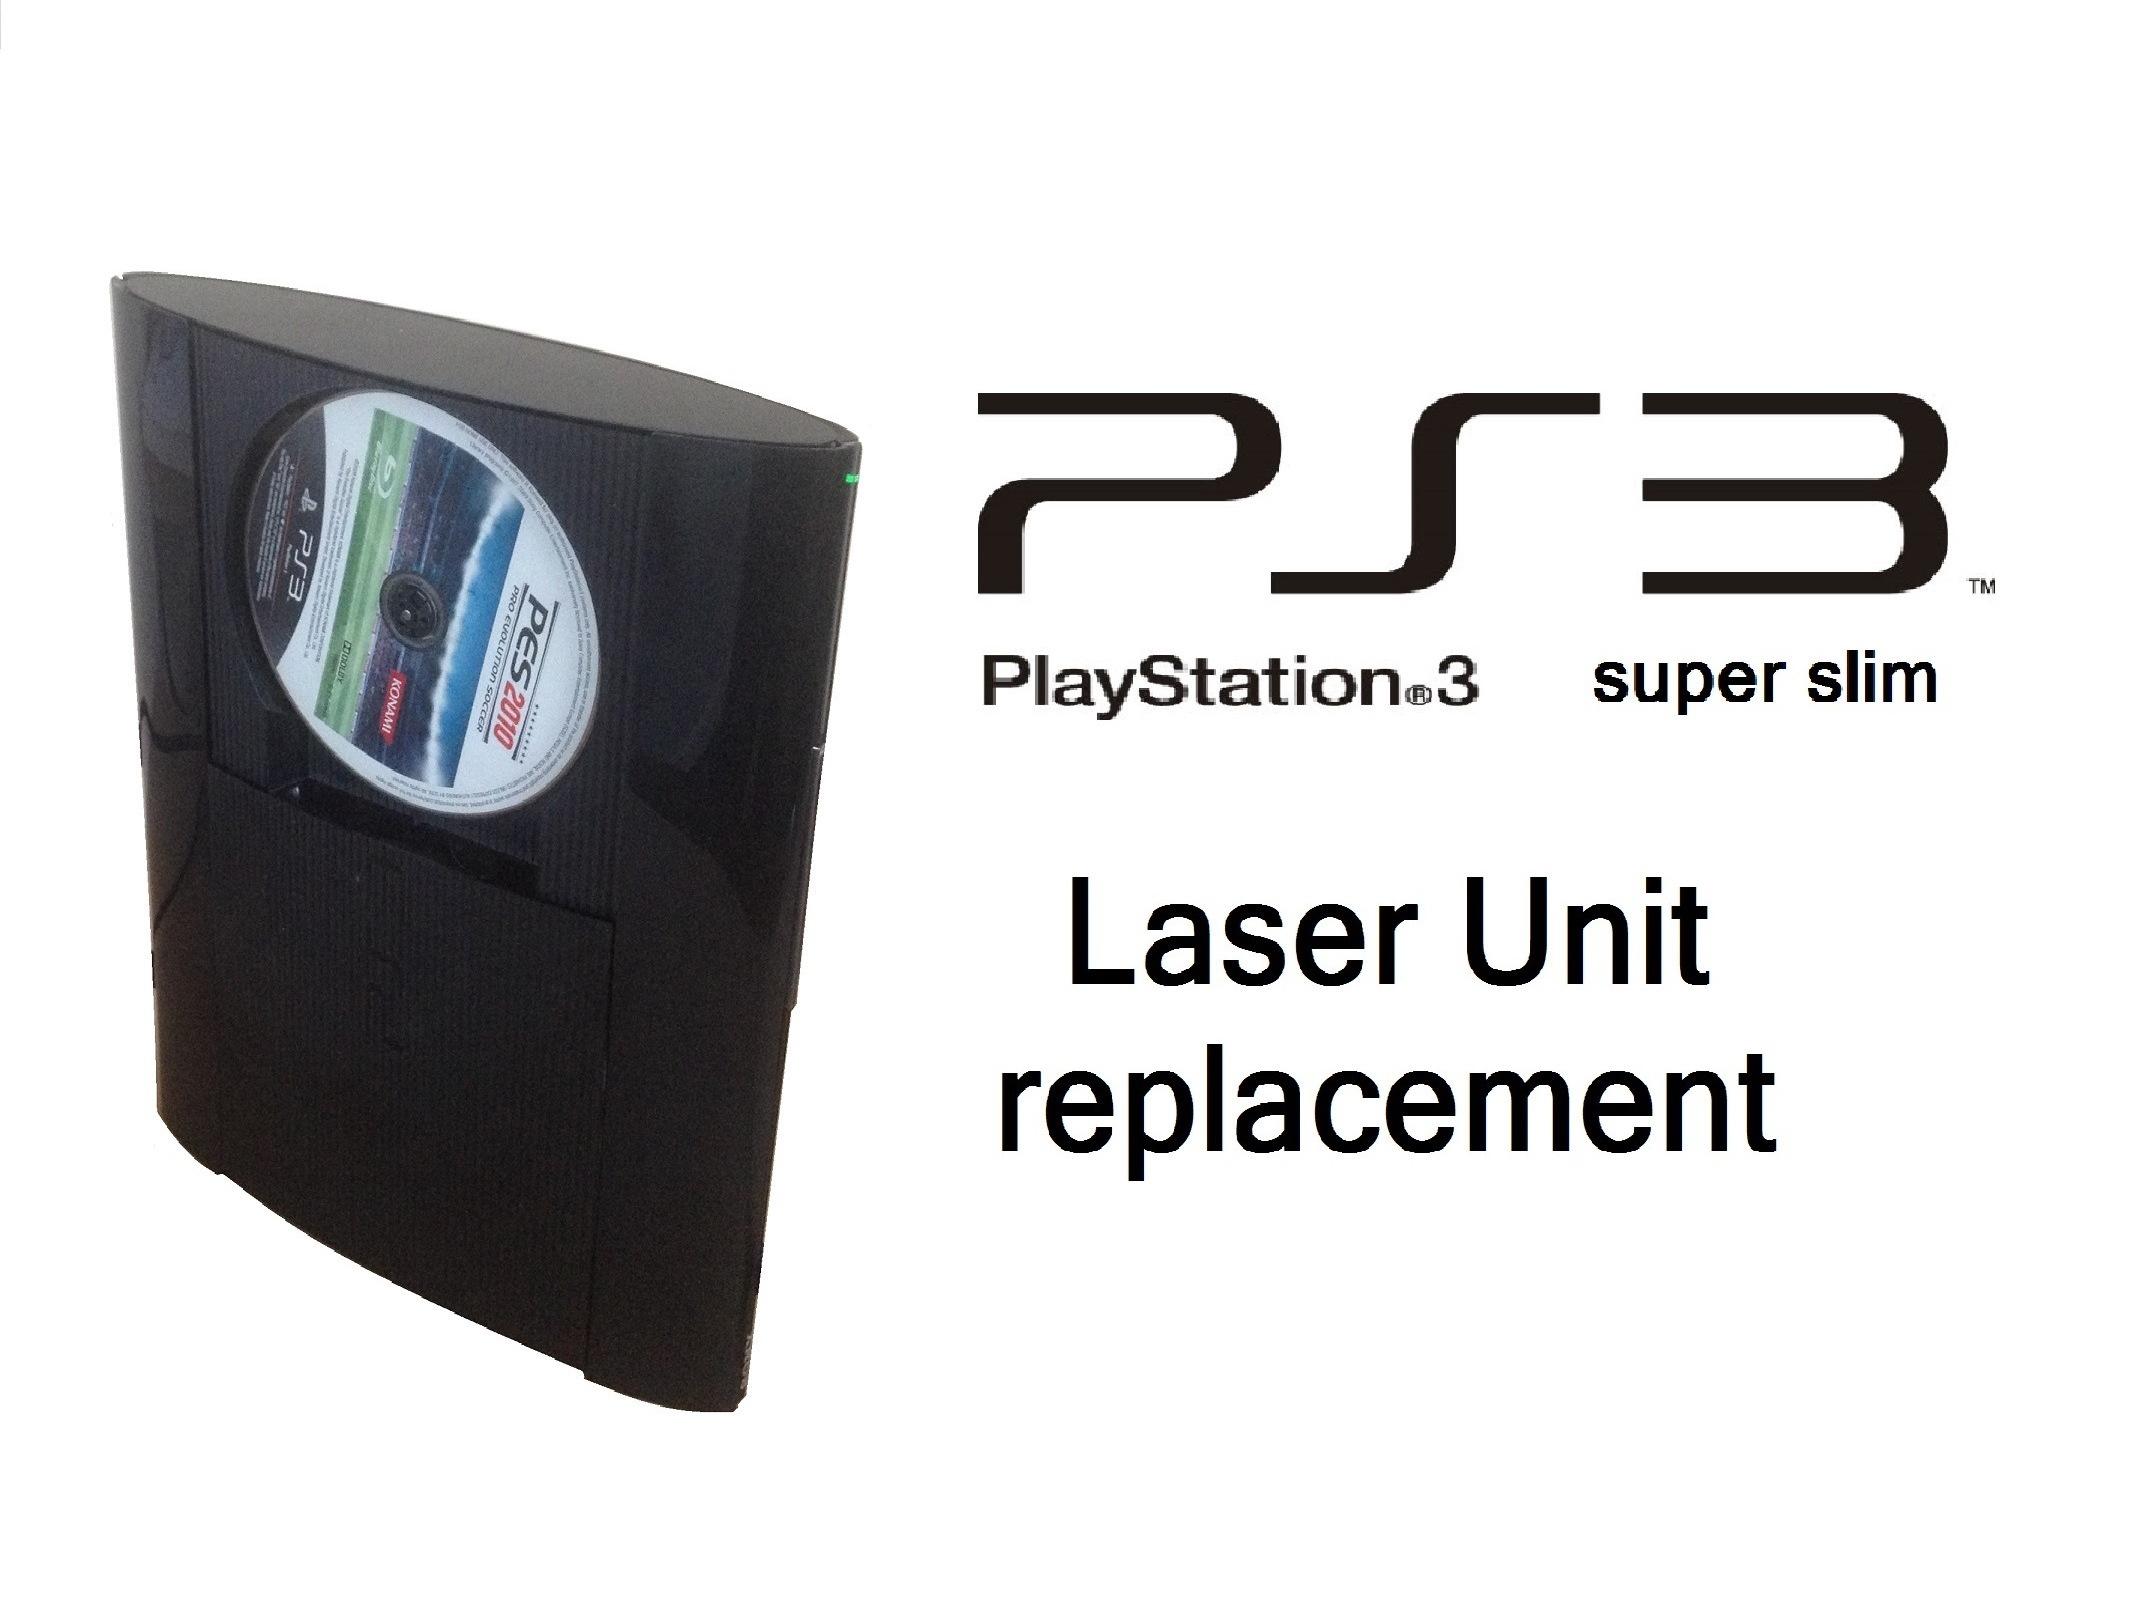 Playstation 3 Super Slim Repair Ifixit Circuit Diagram Laser Unit Deck Replacement